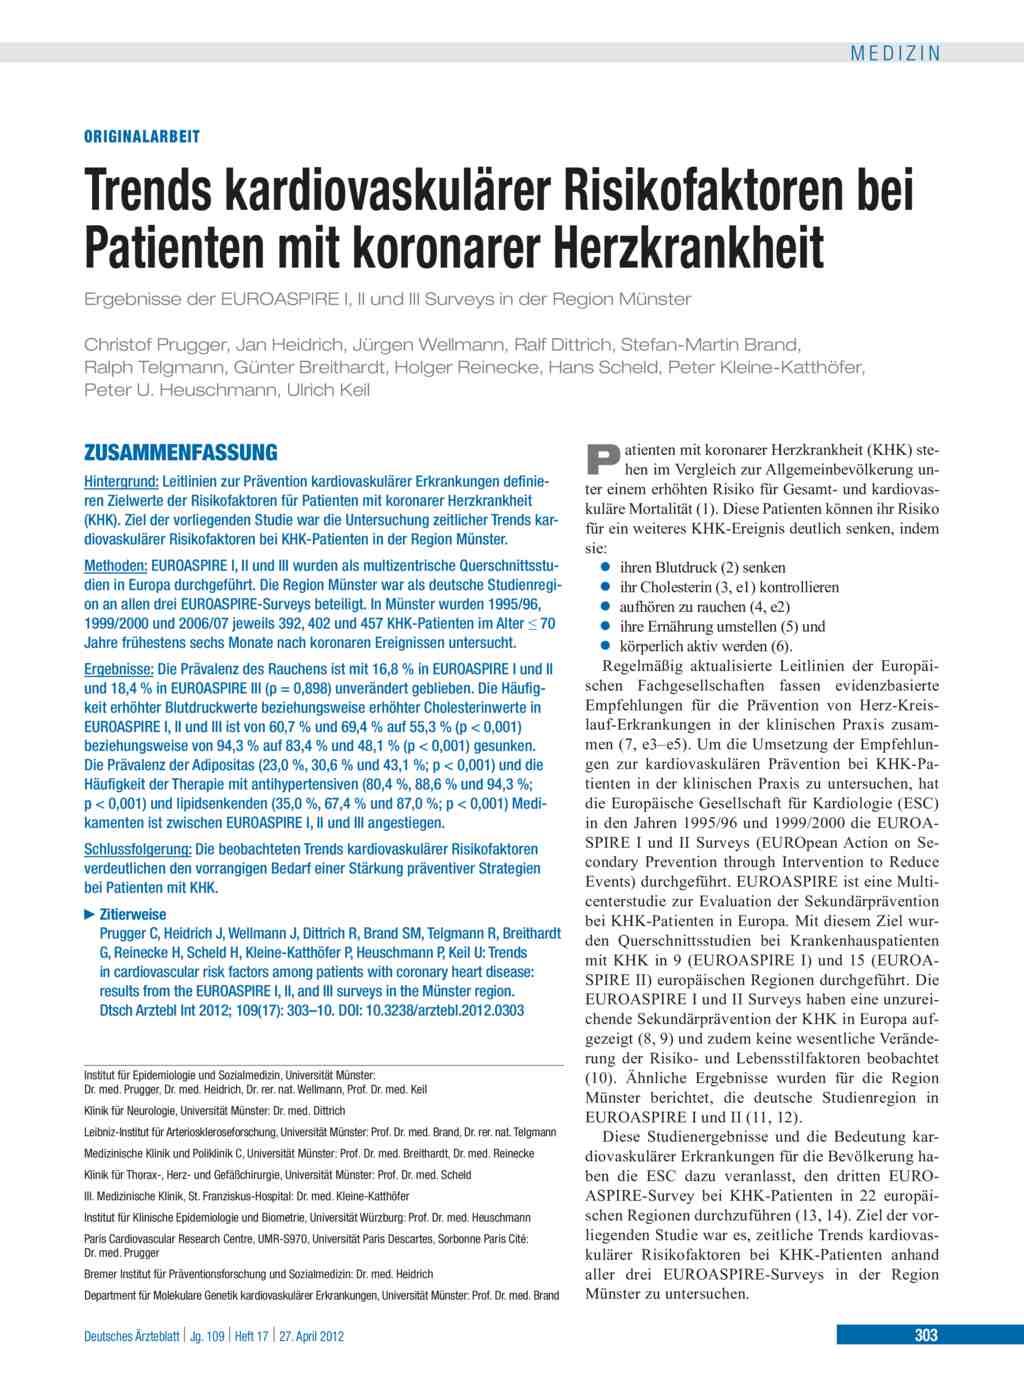 risikofaktoren diabetes mellitus 2 icd-9